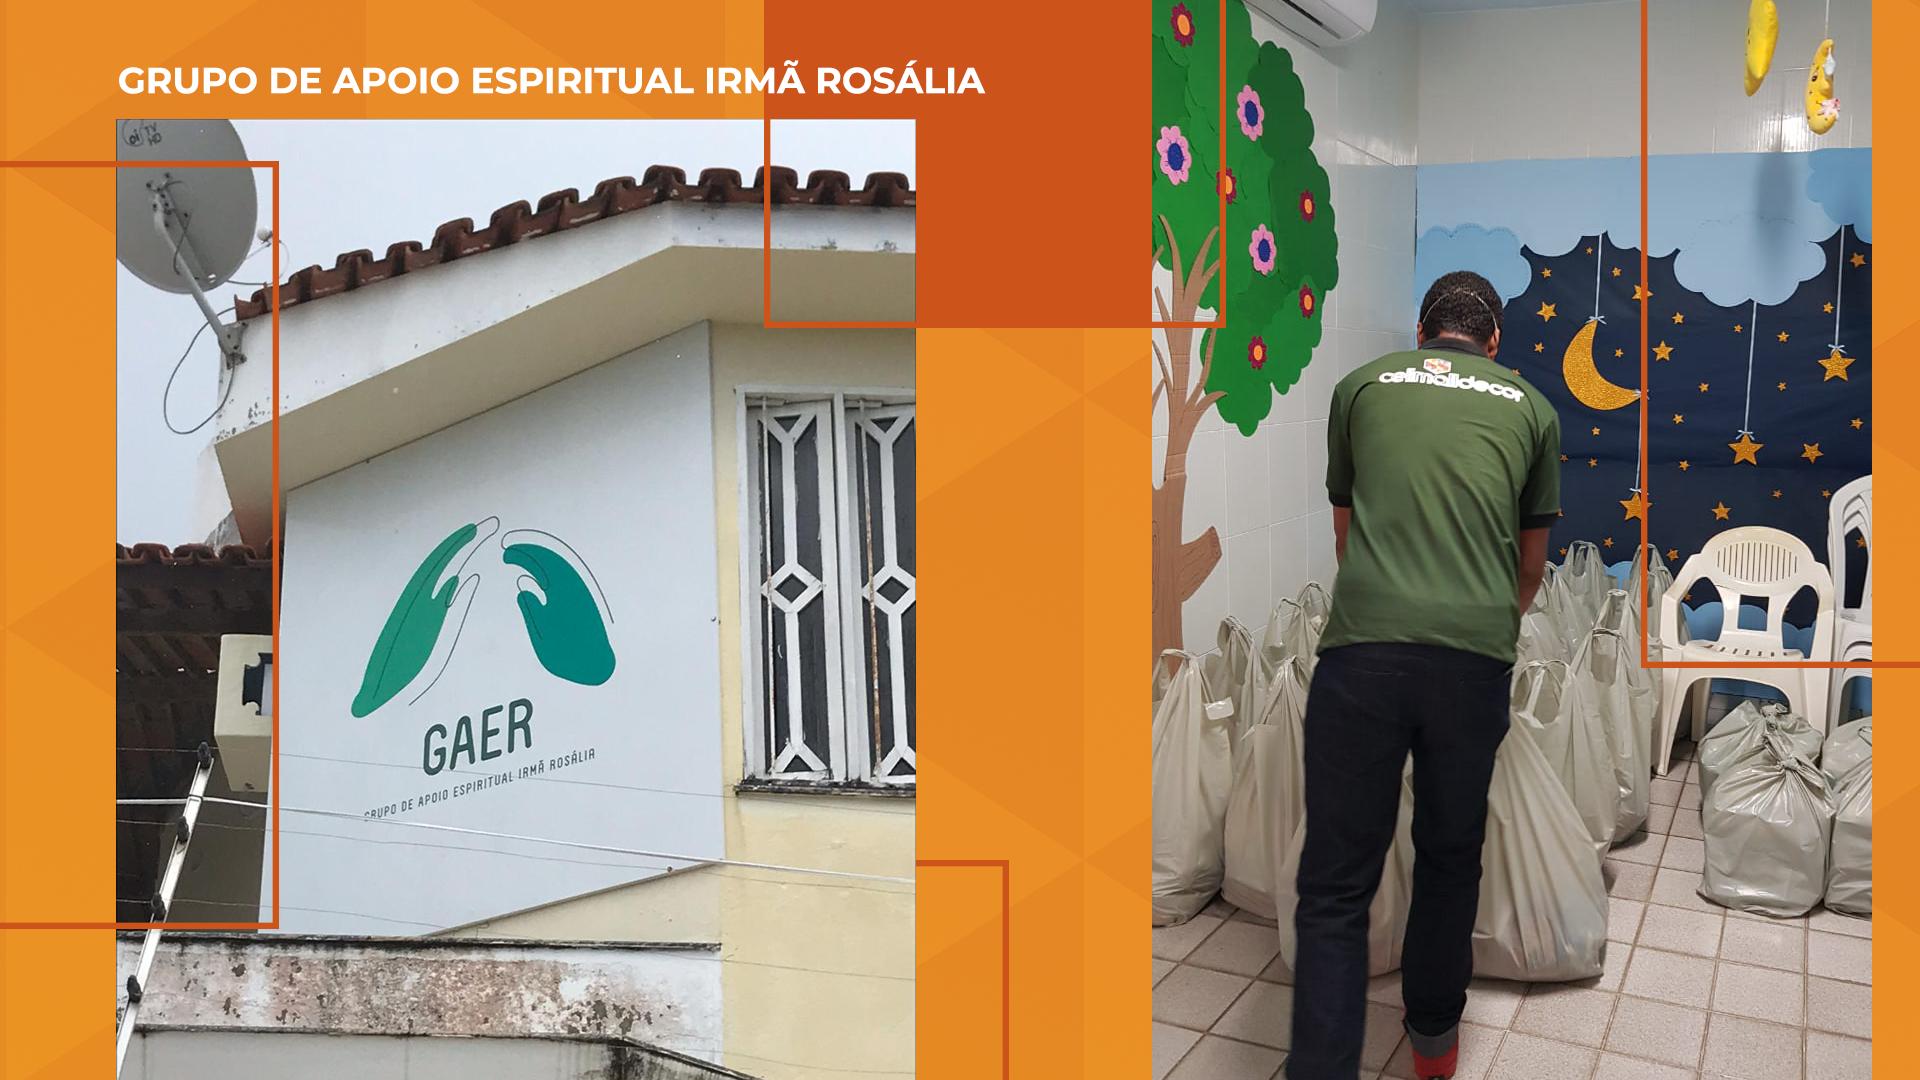 Grupo de Apoio Espiritual Irmâ Rosália.png